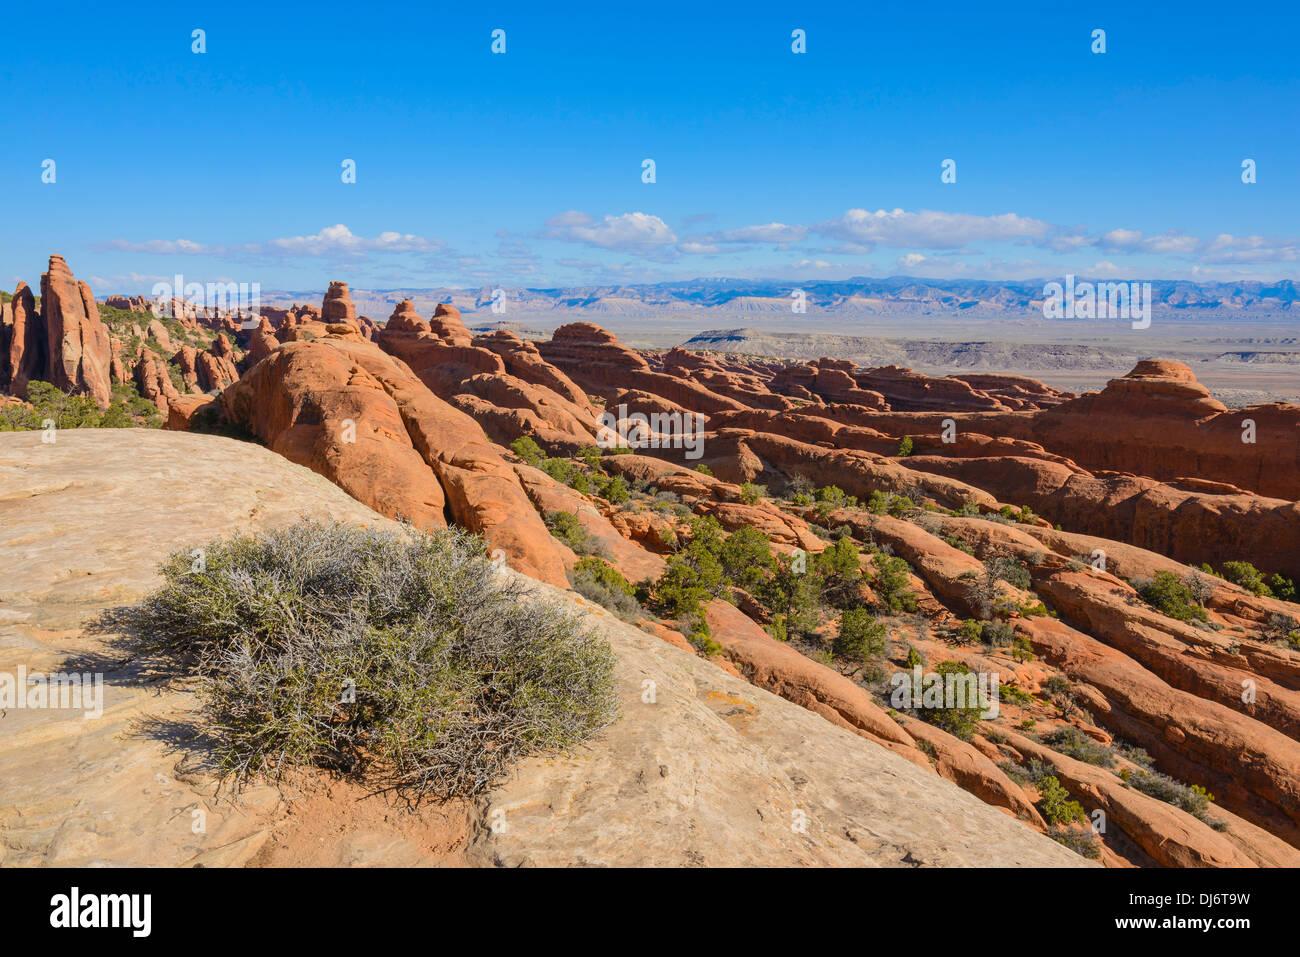 Fins, Rock formations, Devils Garden, Arches National Park, Utah, USA - Stock Image